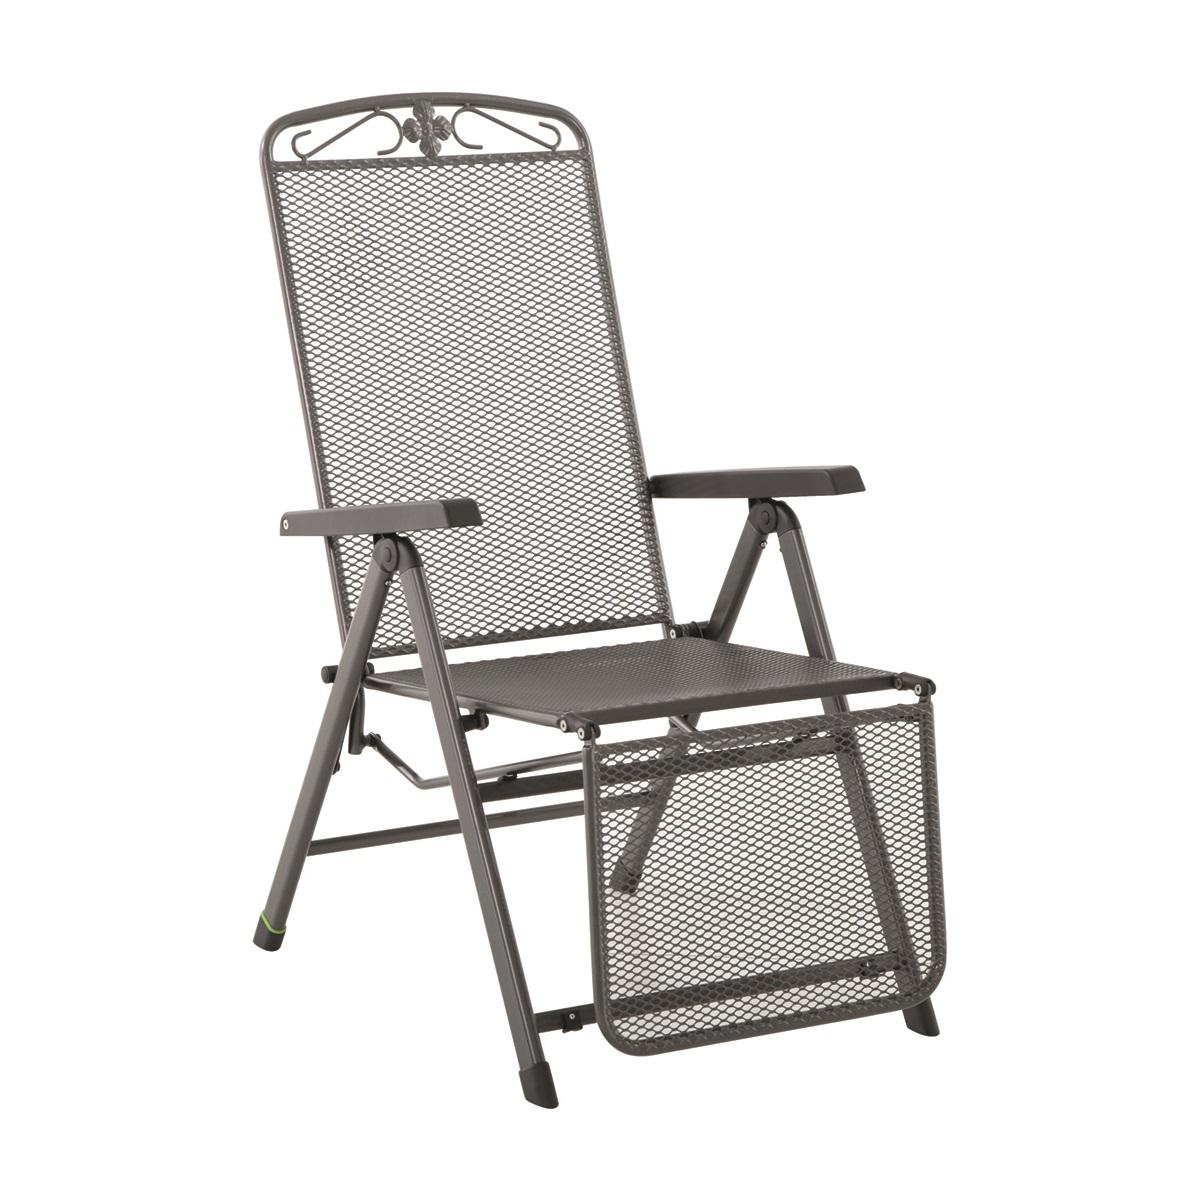 relaxační křeslo z tahokovu (5 pozic) 72,5 x 58 x 110 cm MWH Savoy 5-pos podnožkou